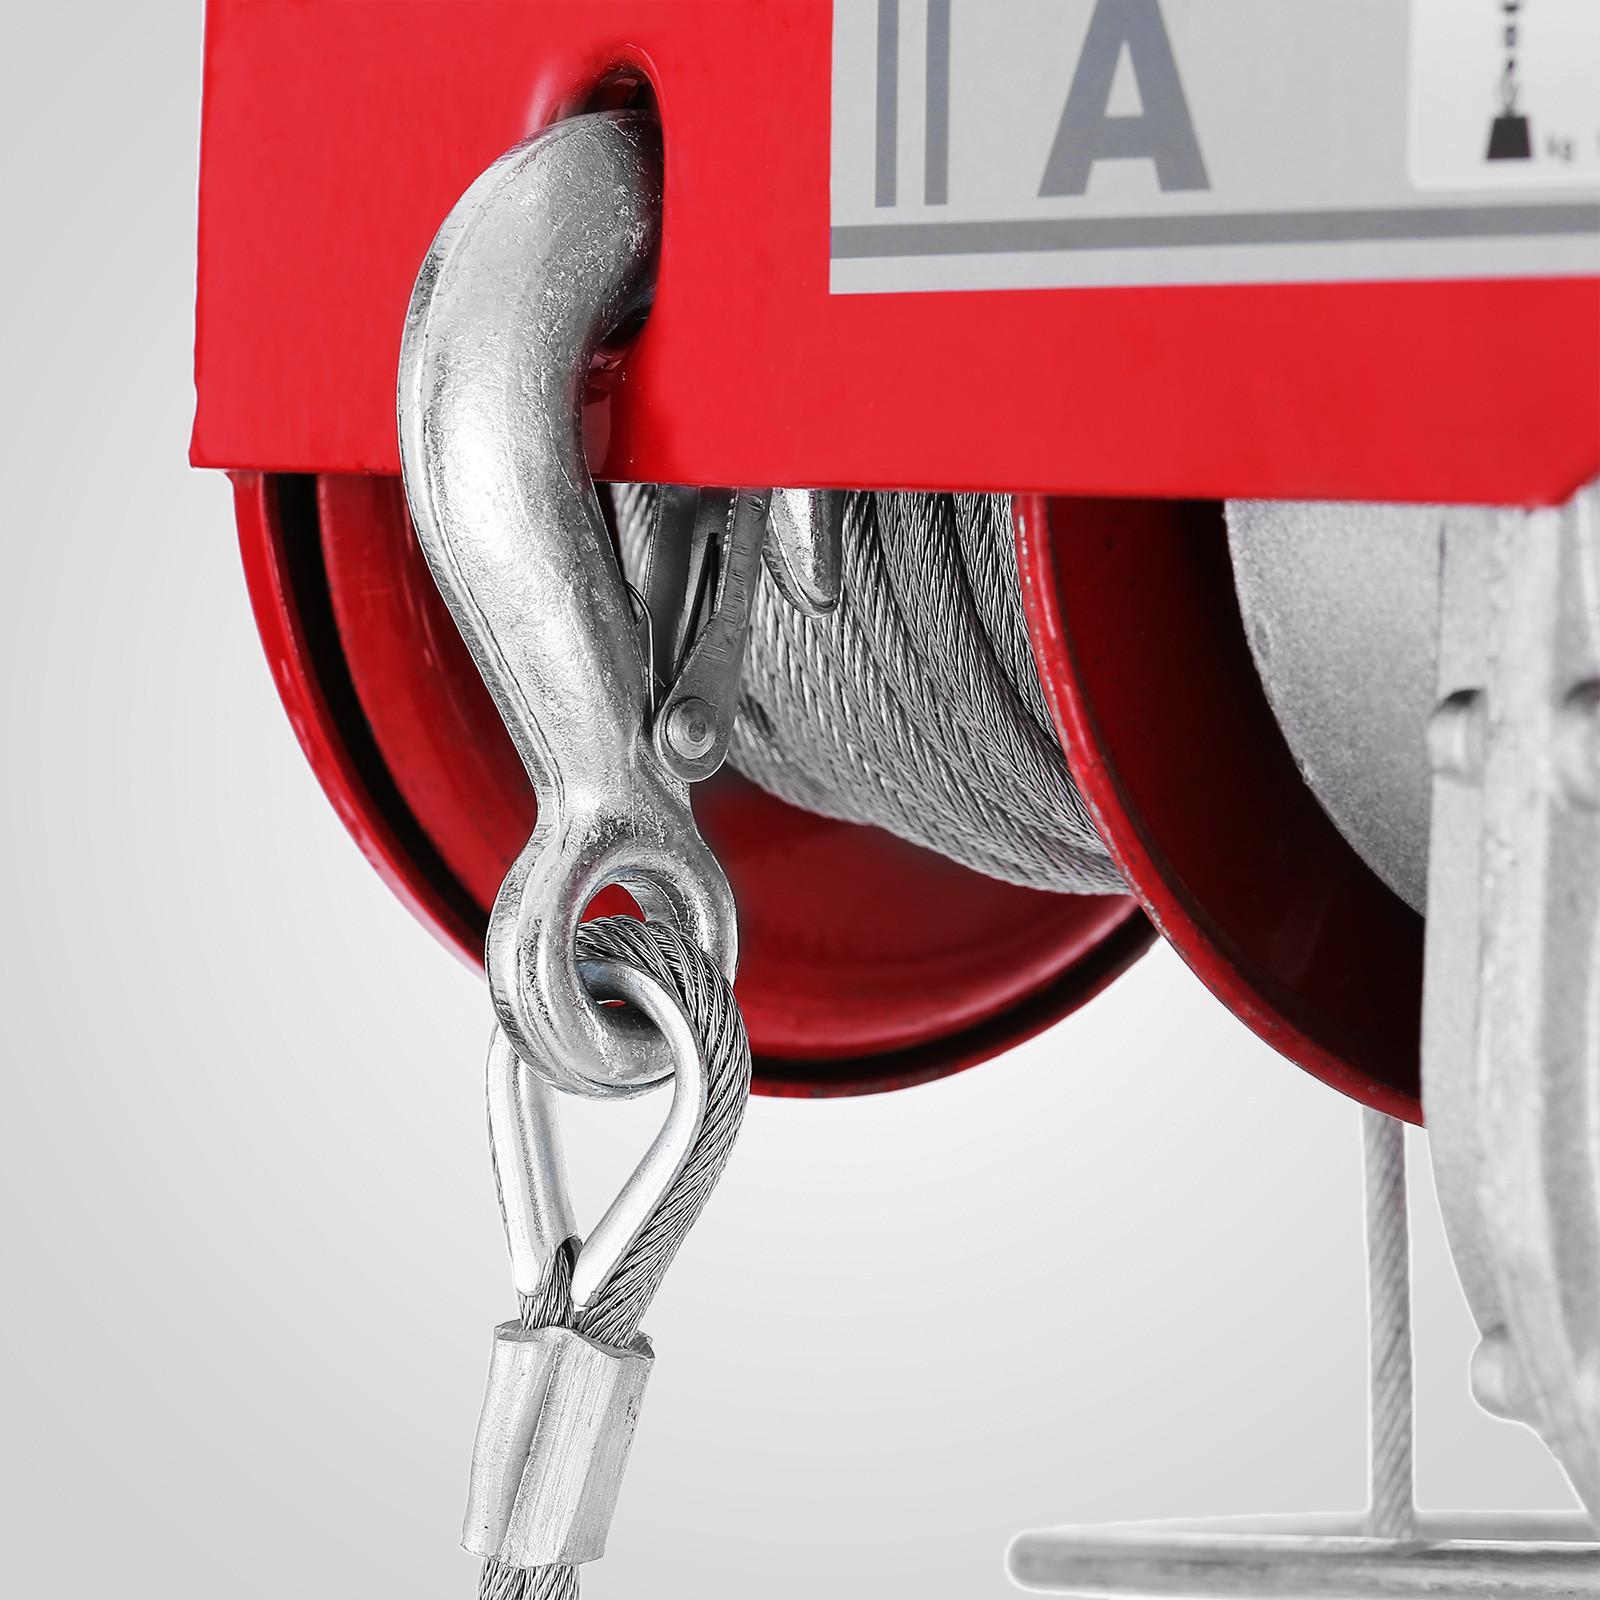 100kg-900kg-Electric-Hoist-Winch-Lifting-Engine-Crane-Cable-Lift-Hook-Garage miniature 57